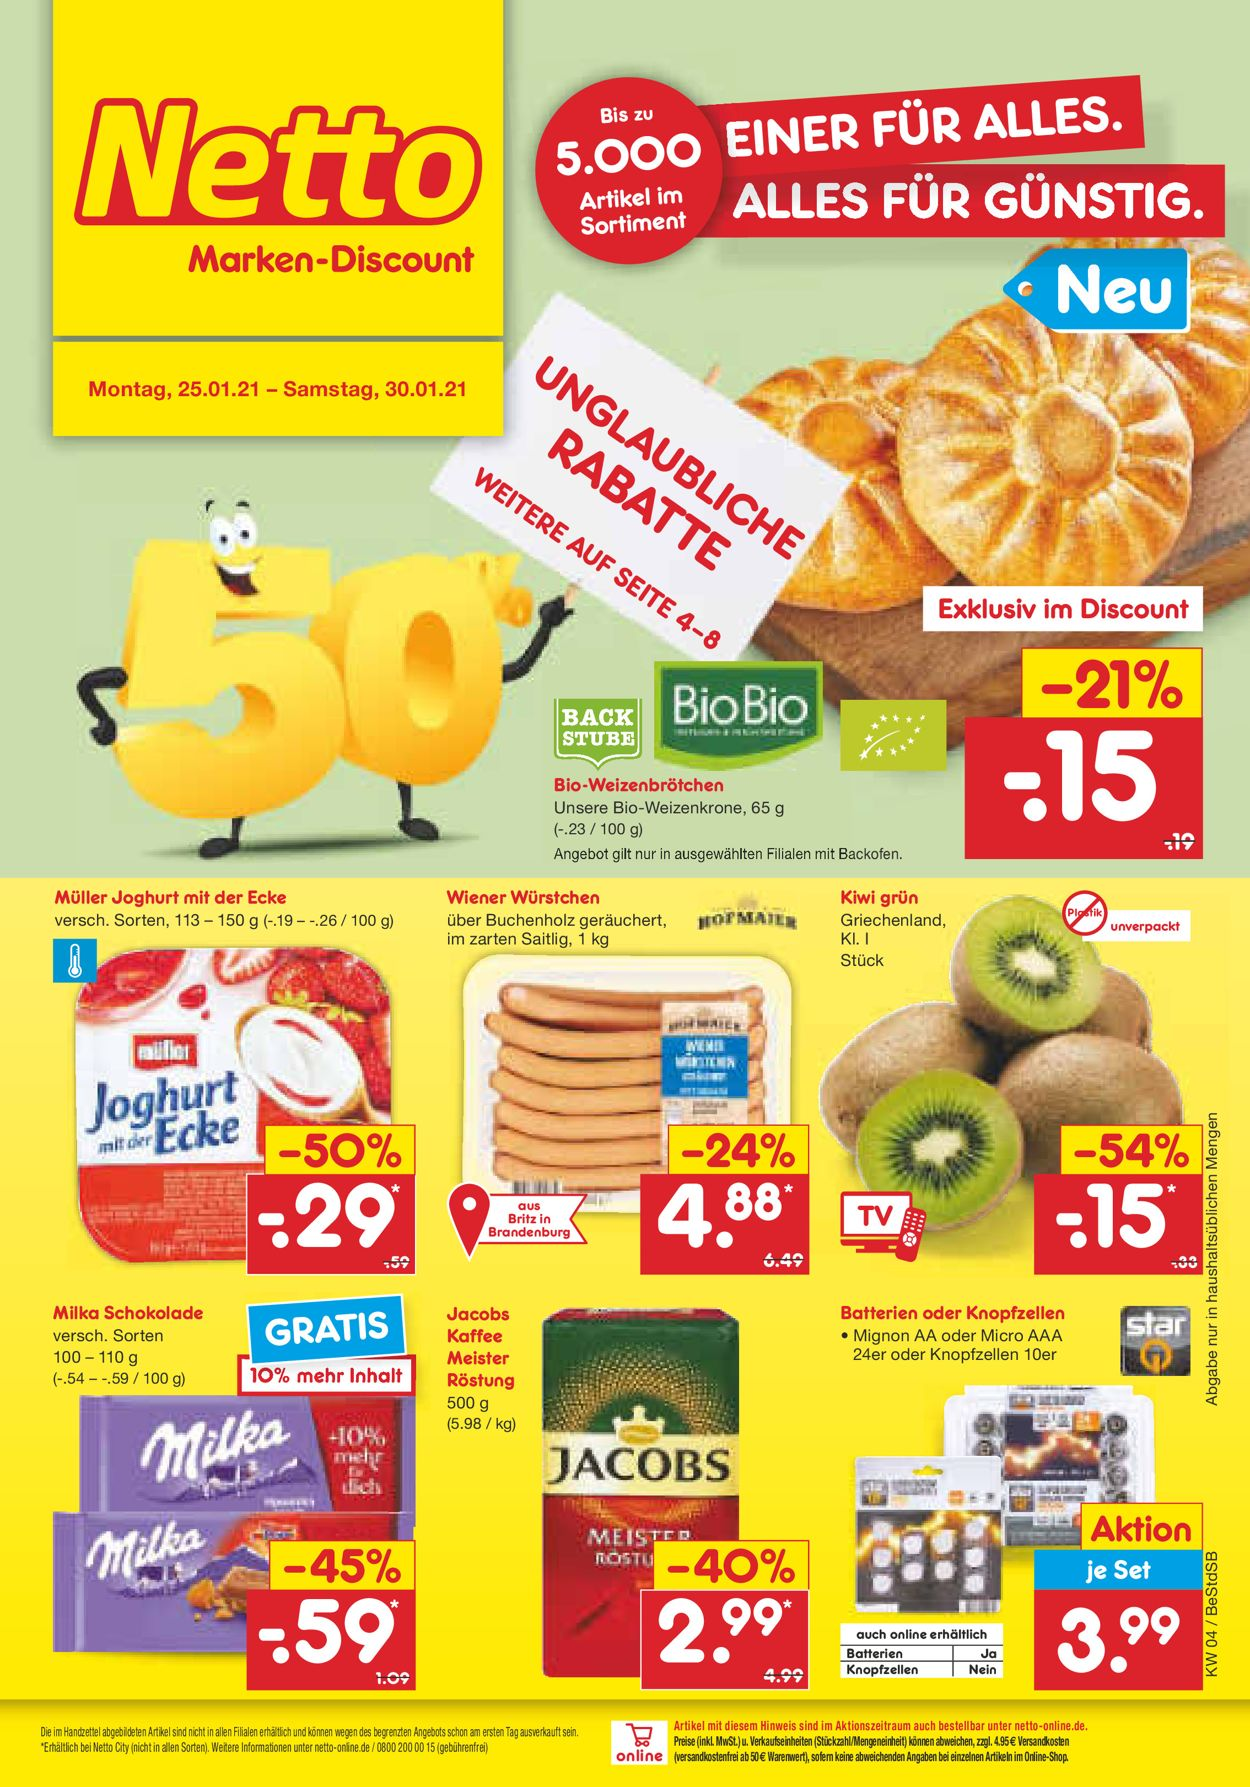 Netto Marken Discount Prospekt   20.20   20.20.20   Rabato